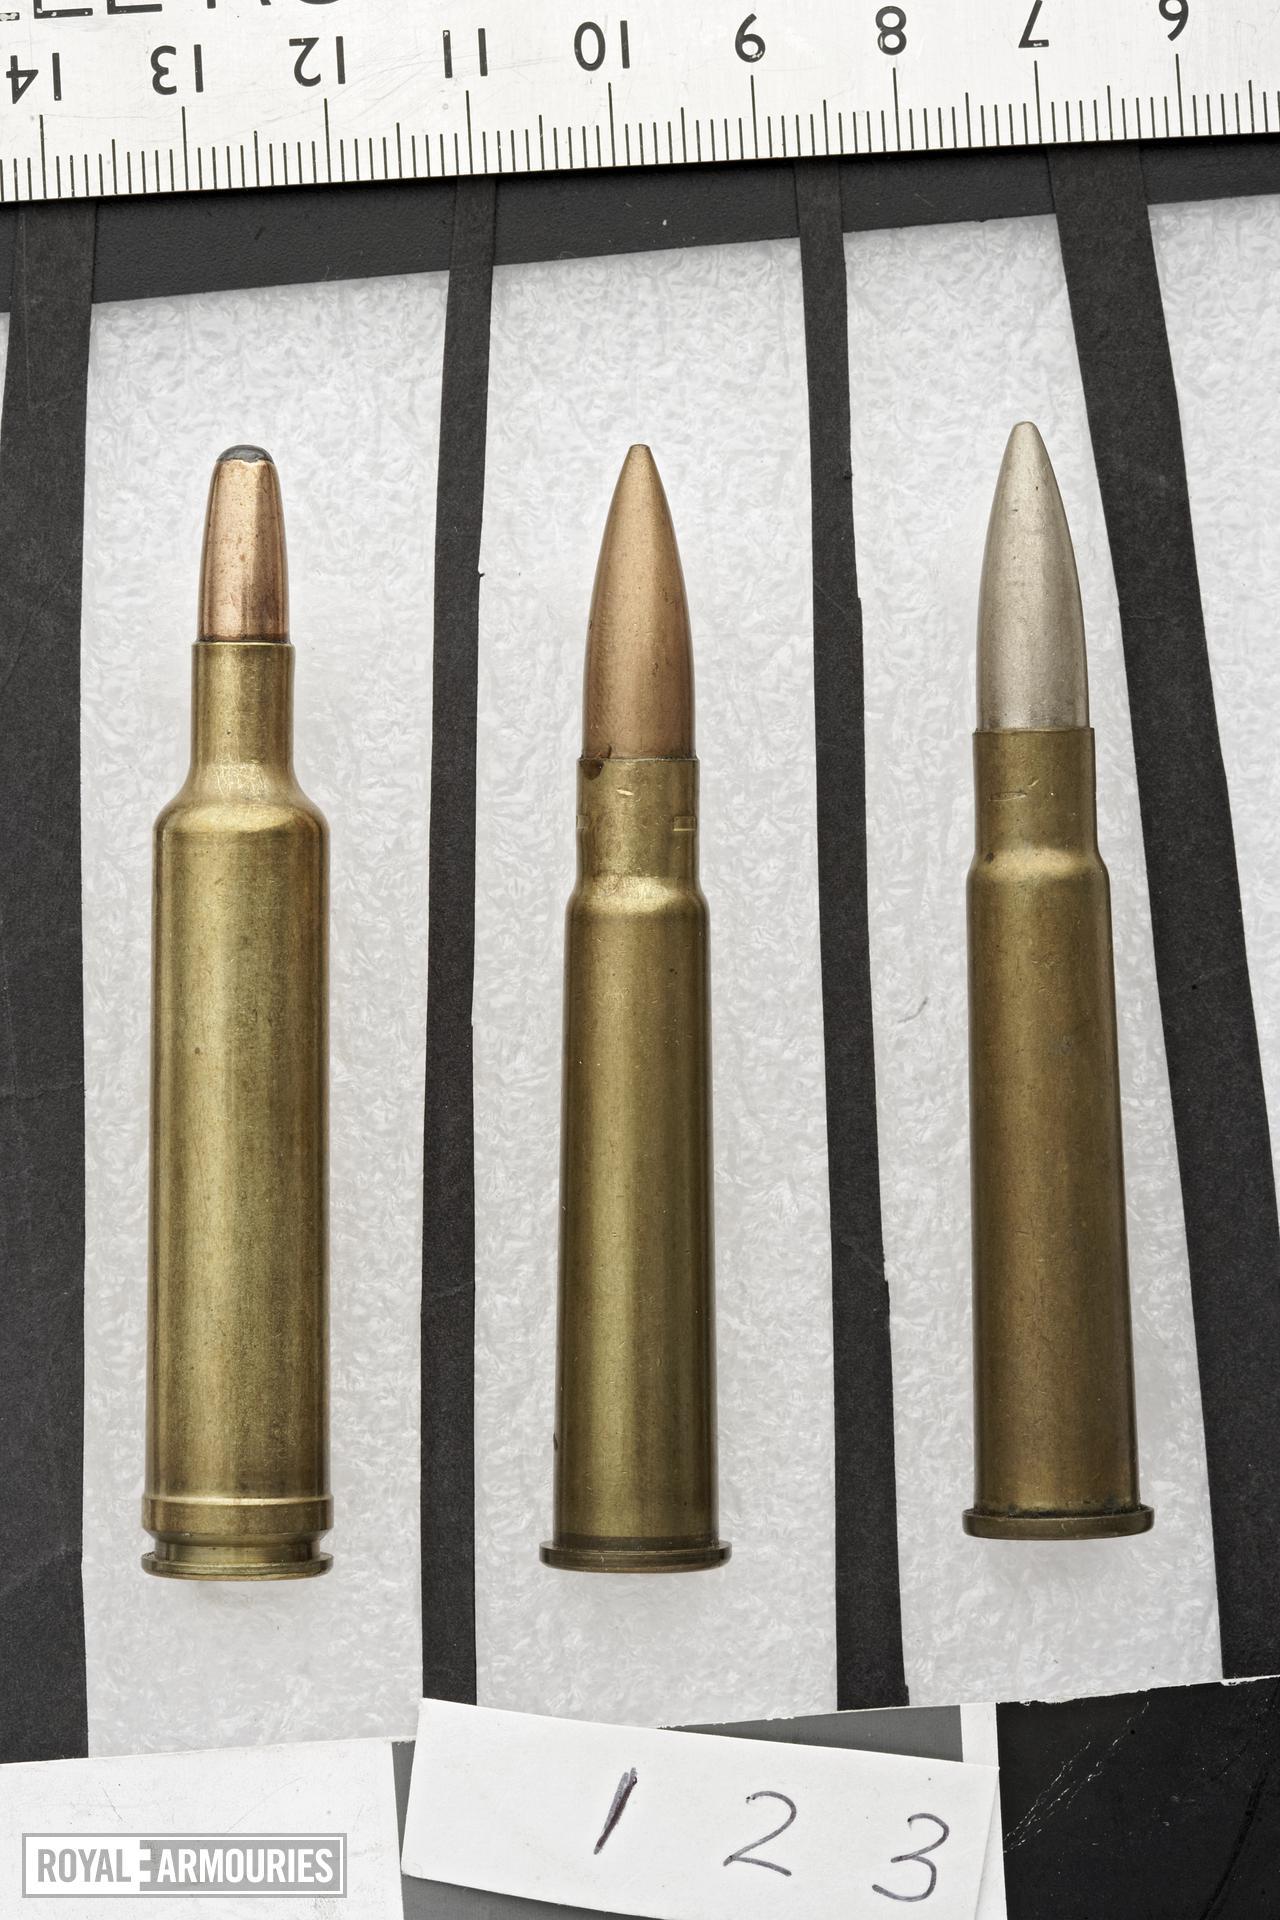 Centrefire rifle cartridge - 7.7 mm